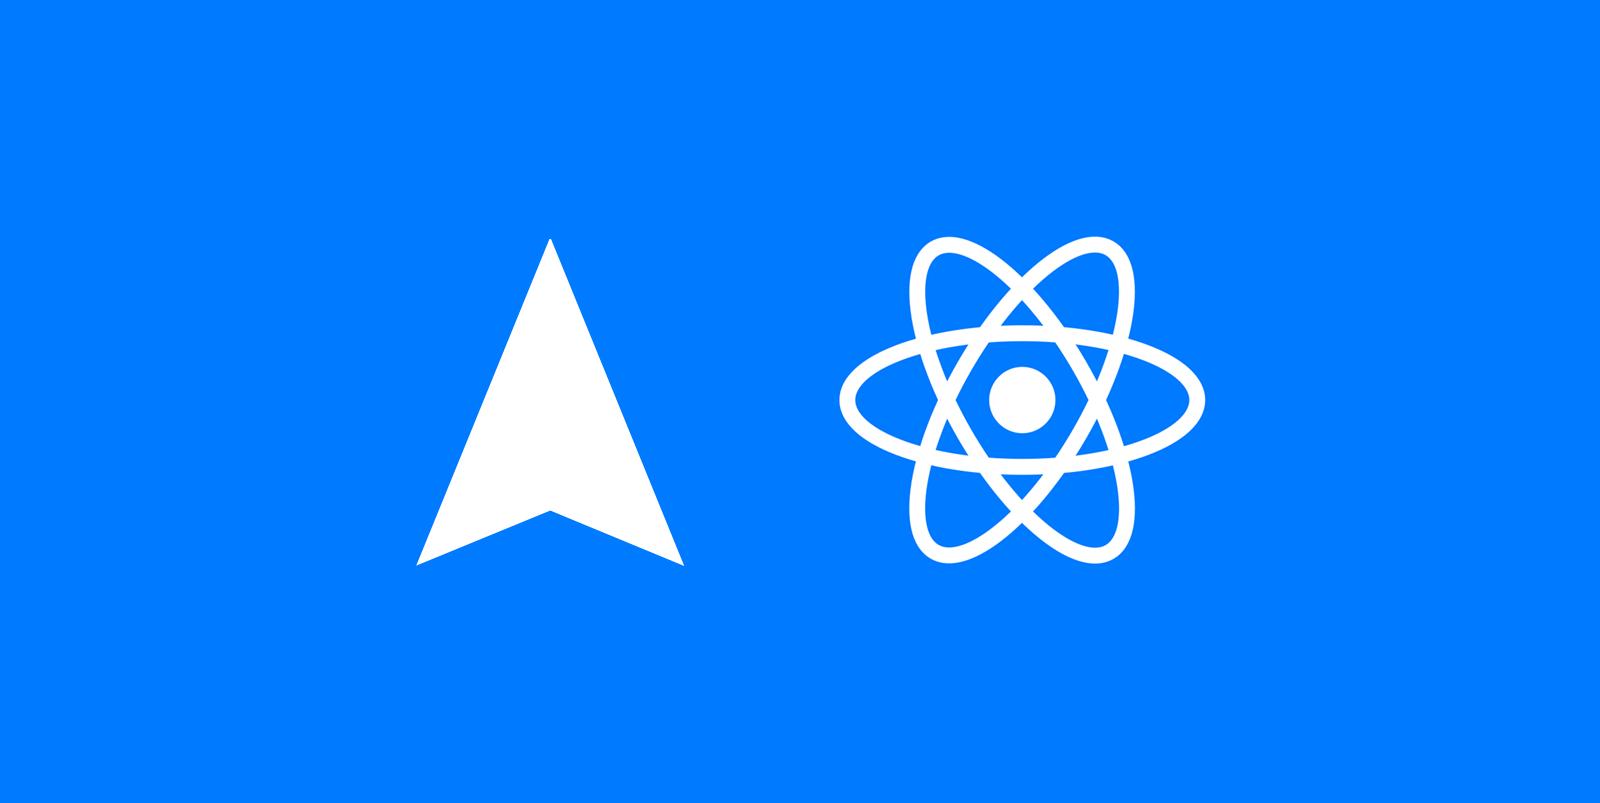 https://s3.amazonaws.com/io.radar.blog/posts/introducing-react-native-support-for-radar-58604e925de1/react.png